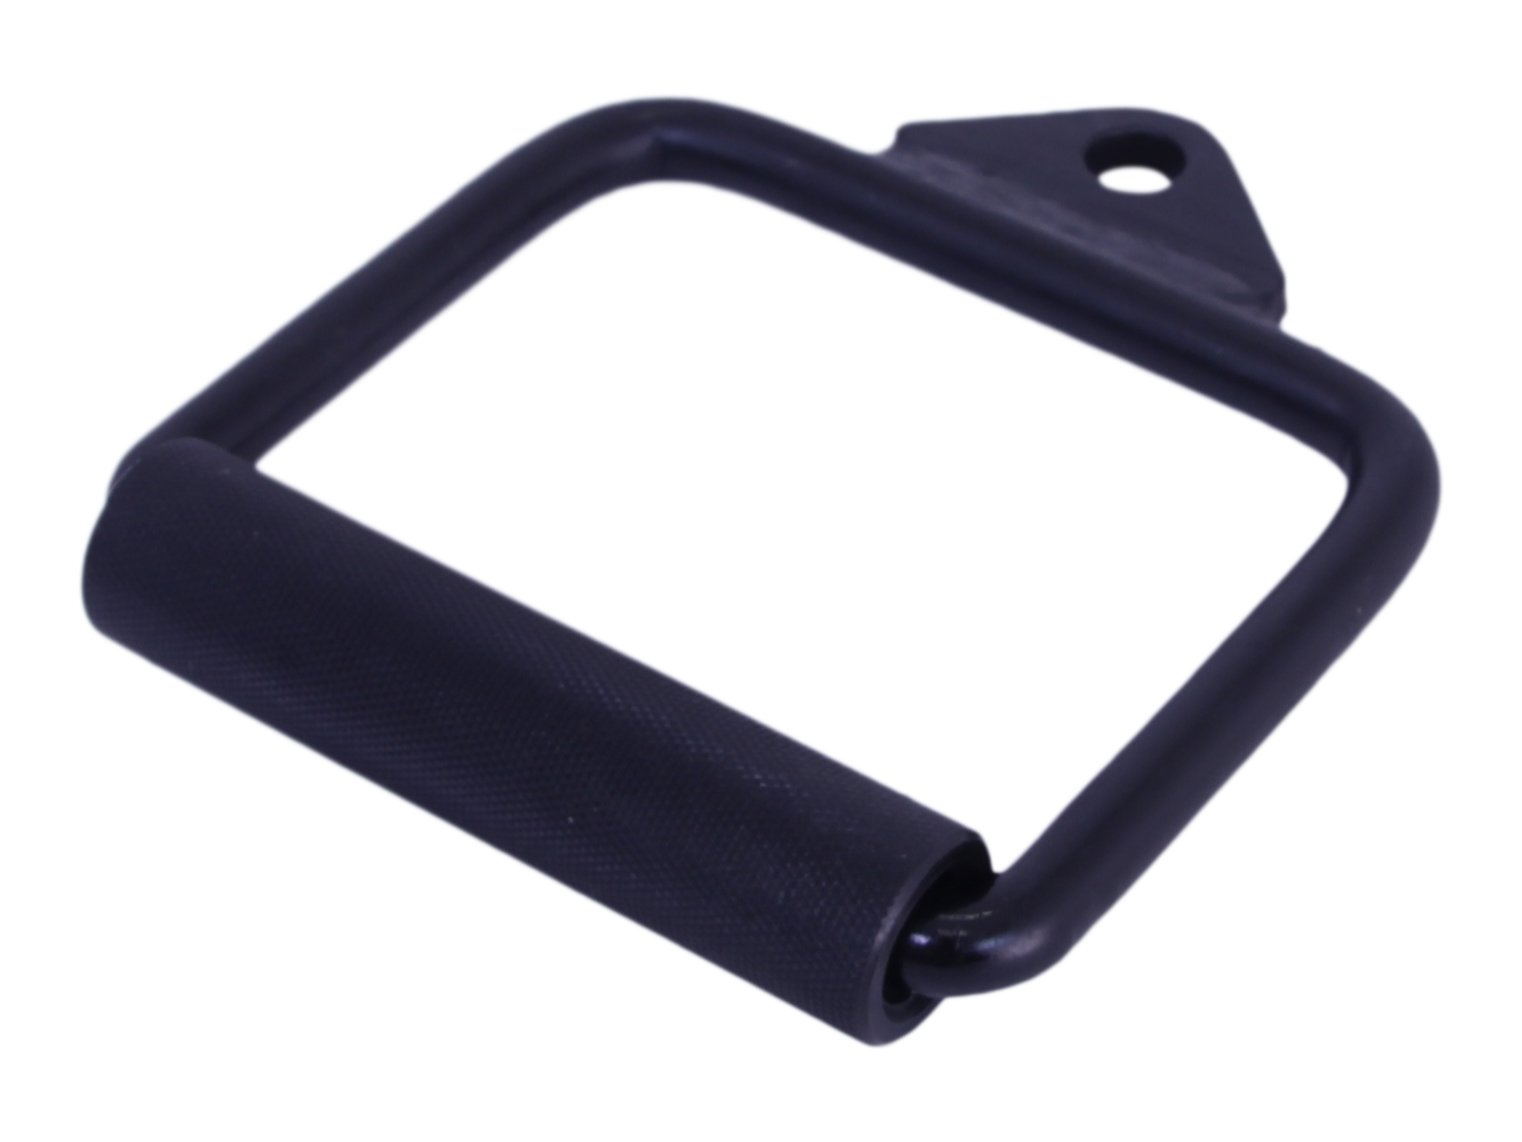 Lifemaxx Black Series Cable Handle